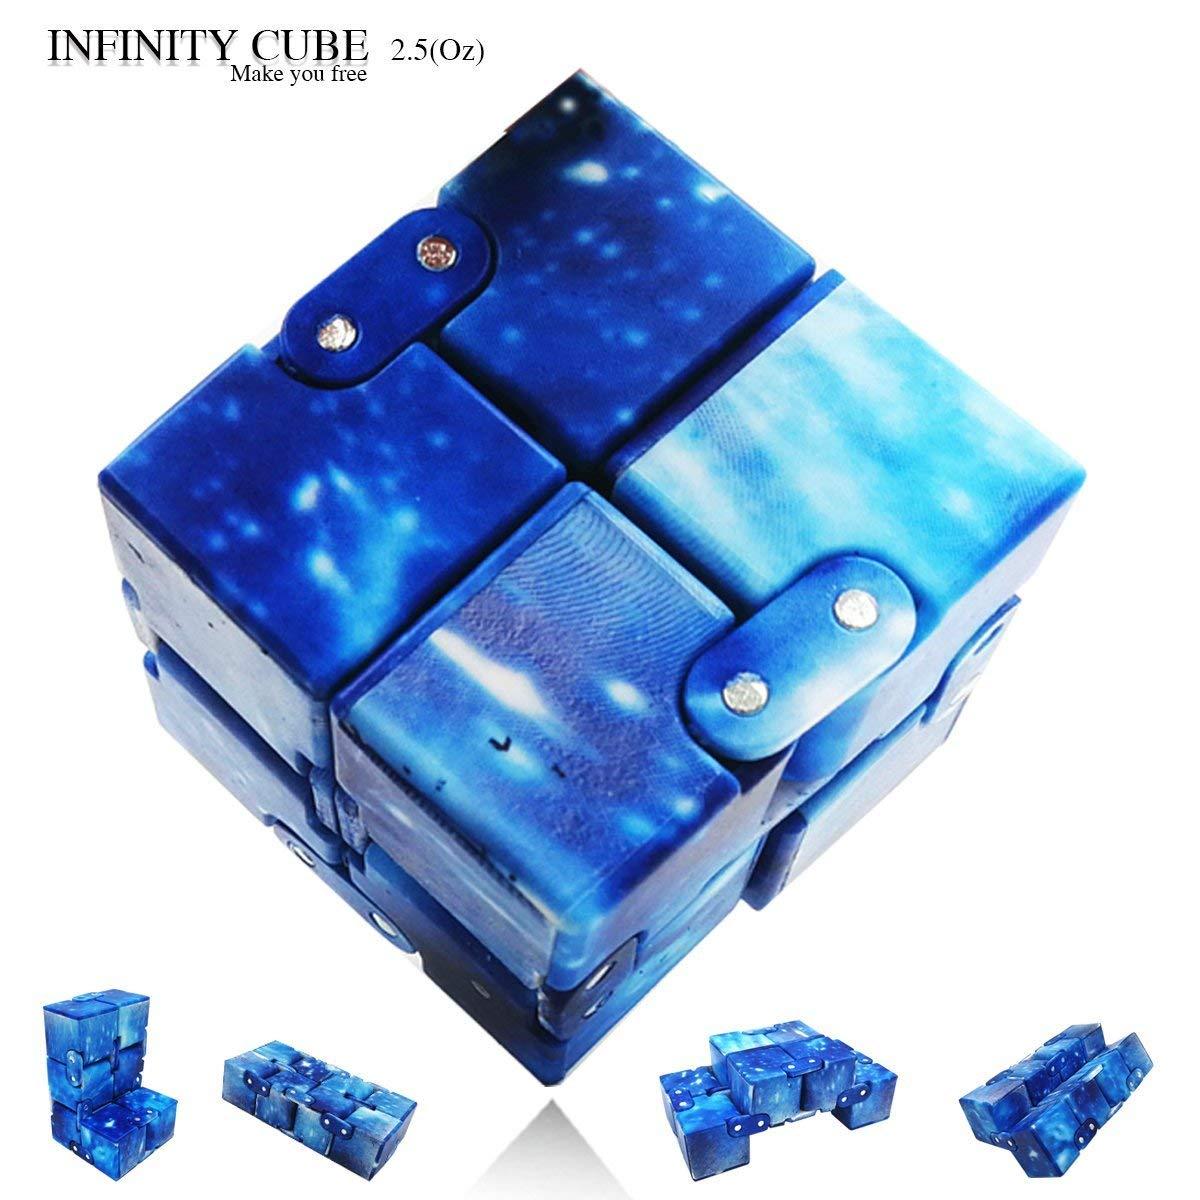 LIHJO Interstellar Infinity Cube Fidget Cube Anti Stress Adults Kids Gift EDC for ADHD Funny Finger Toys